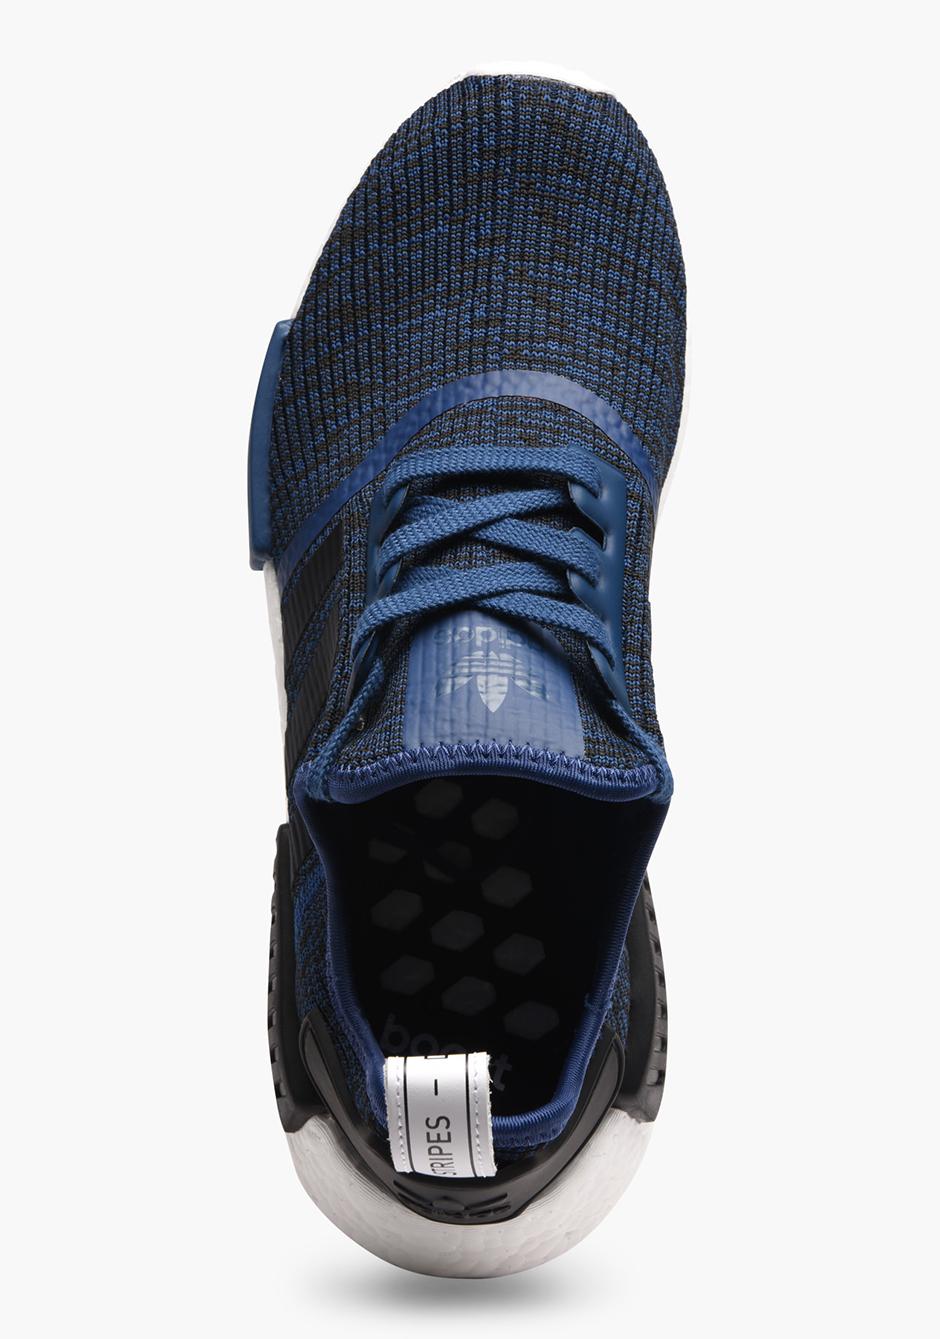 Adidas Nmd R1 Blå Sort 2k8q0LEOfW